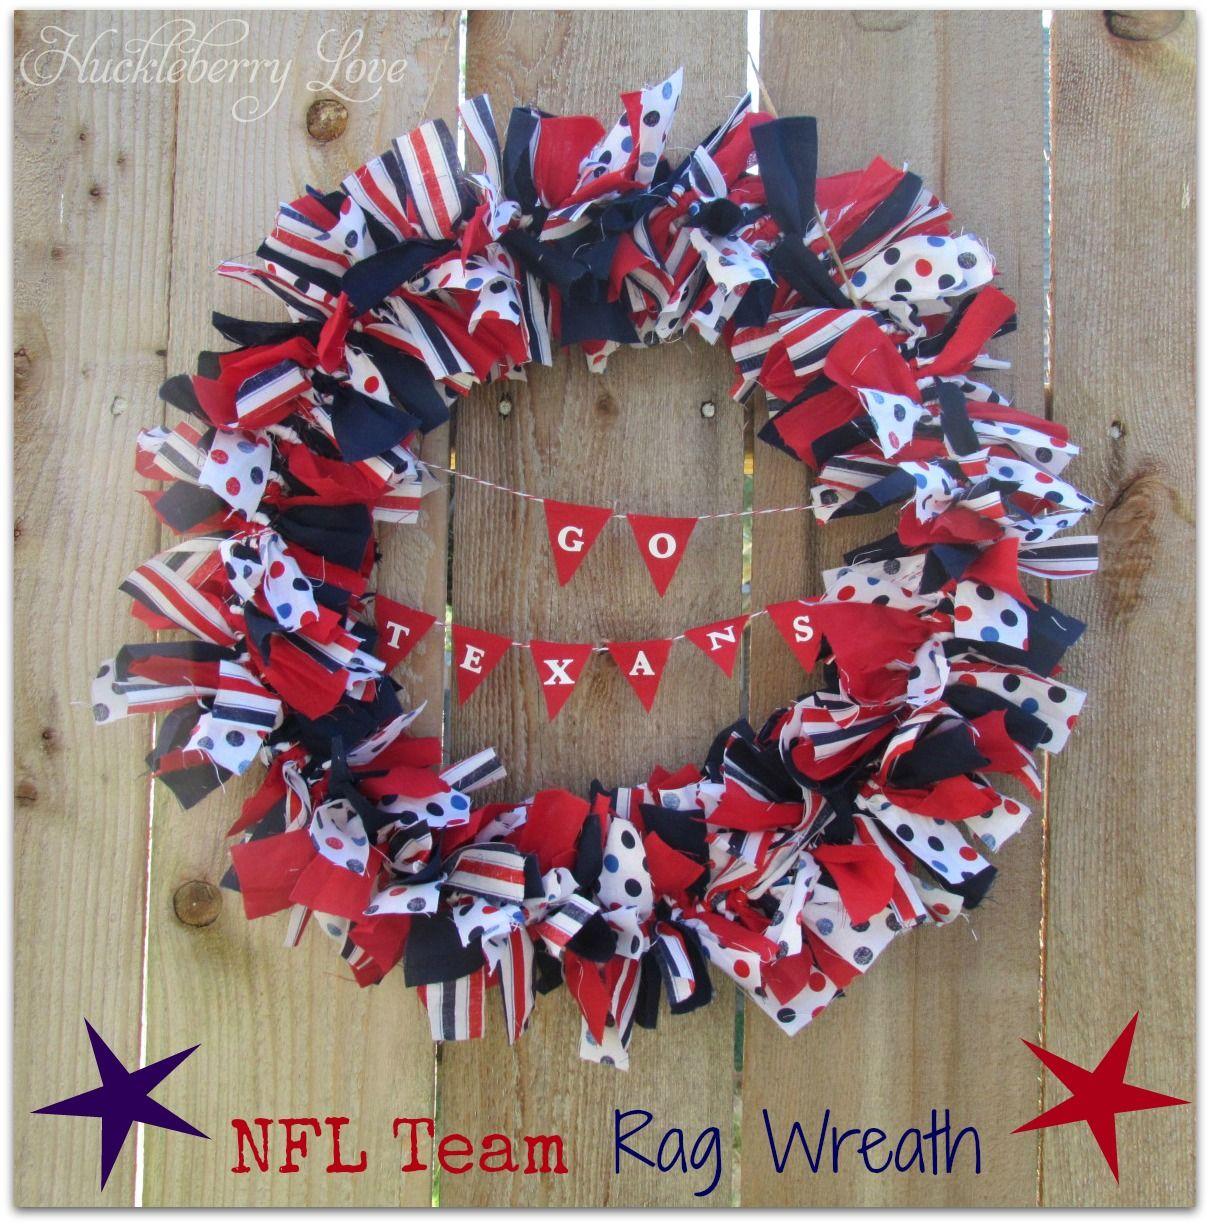 Nfl Team Rag Wreath Tutorial Rag Wreath Tutorial Rag Wreath